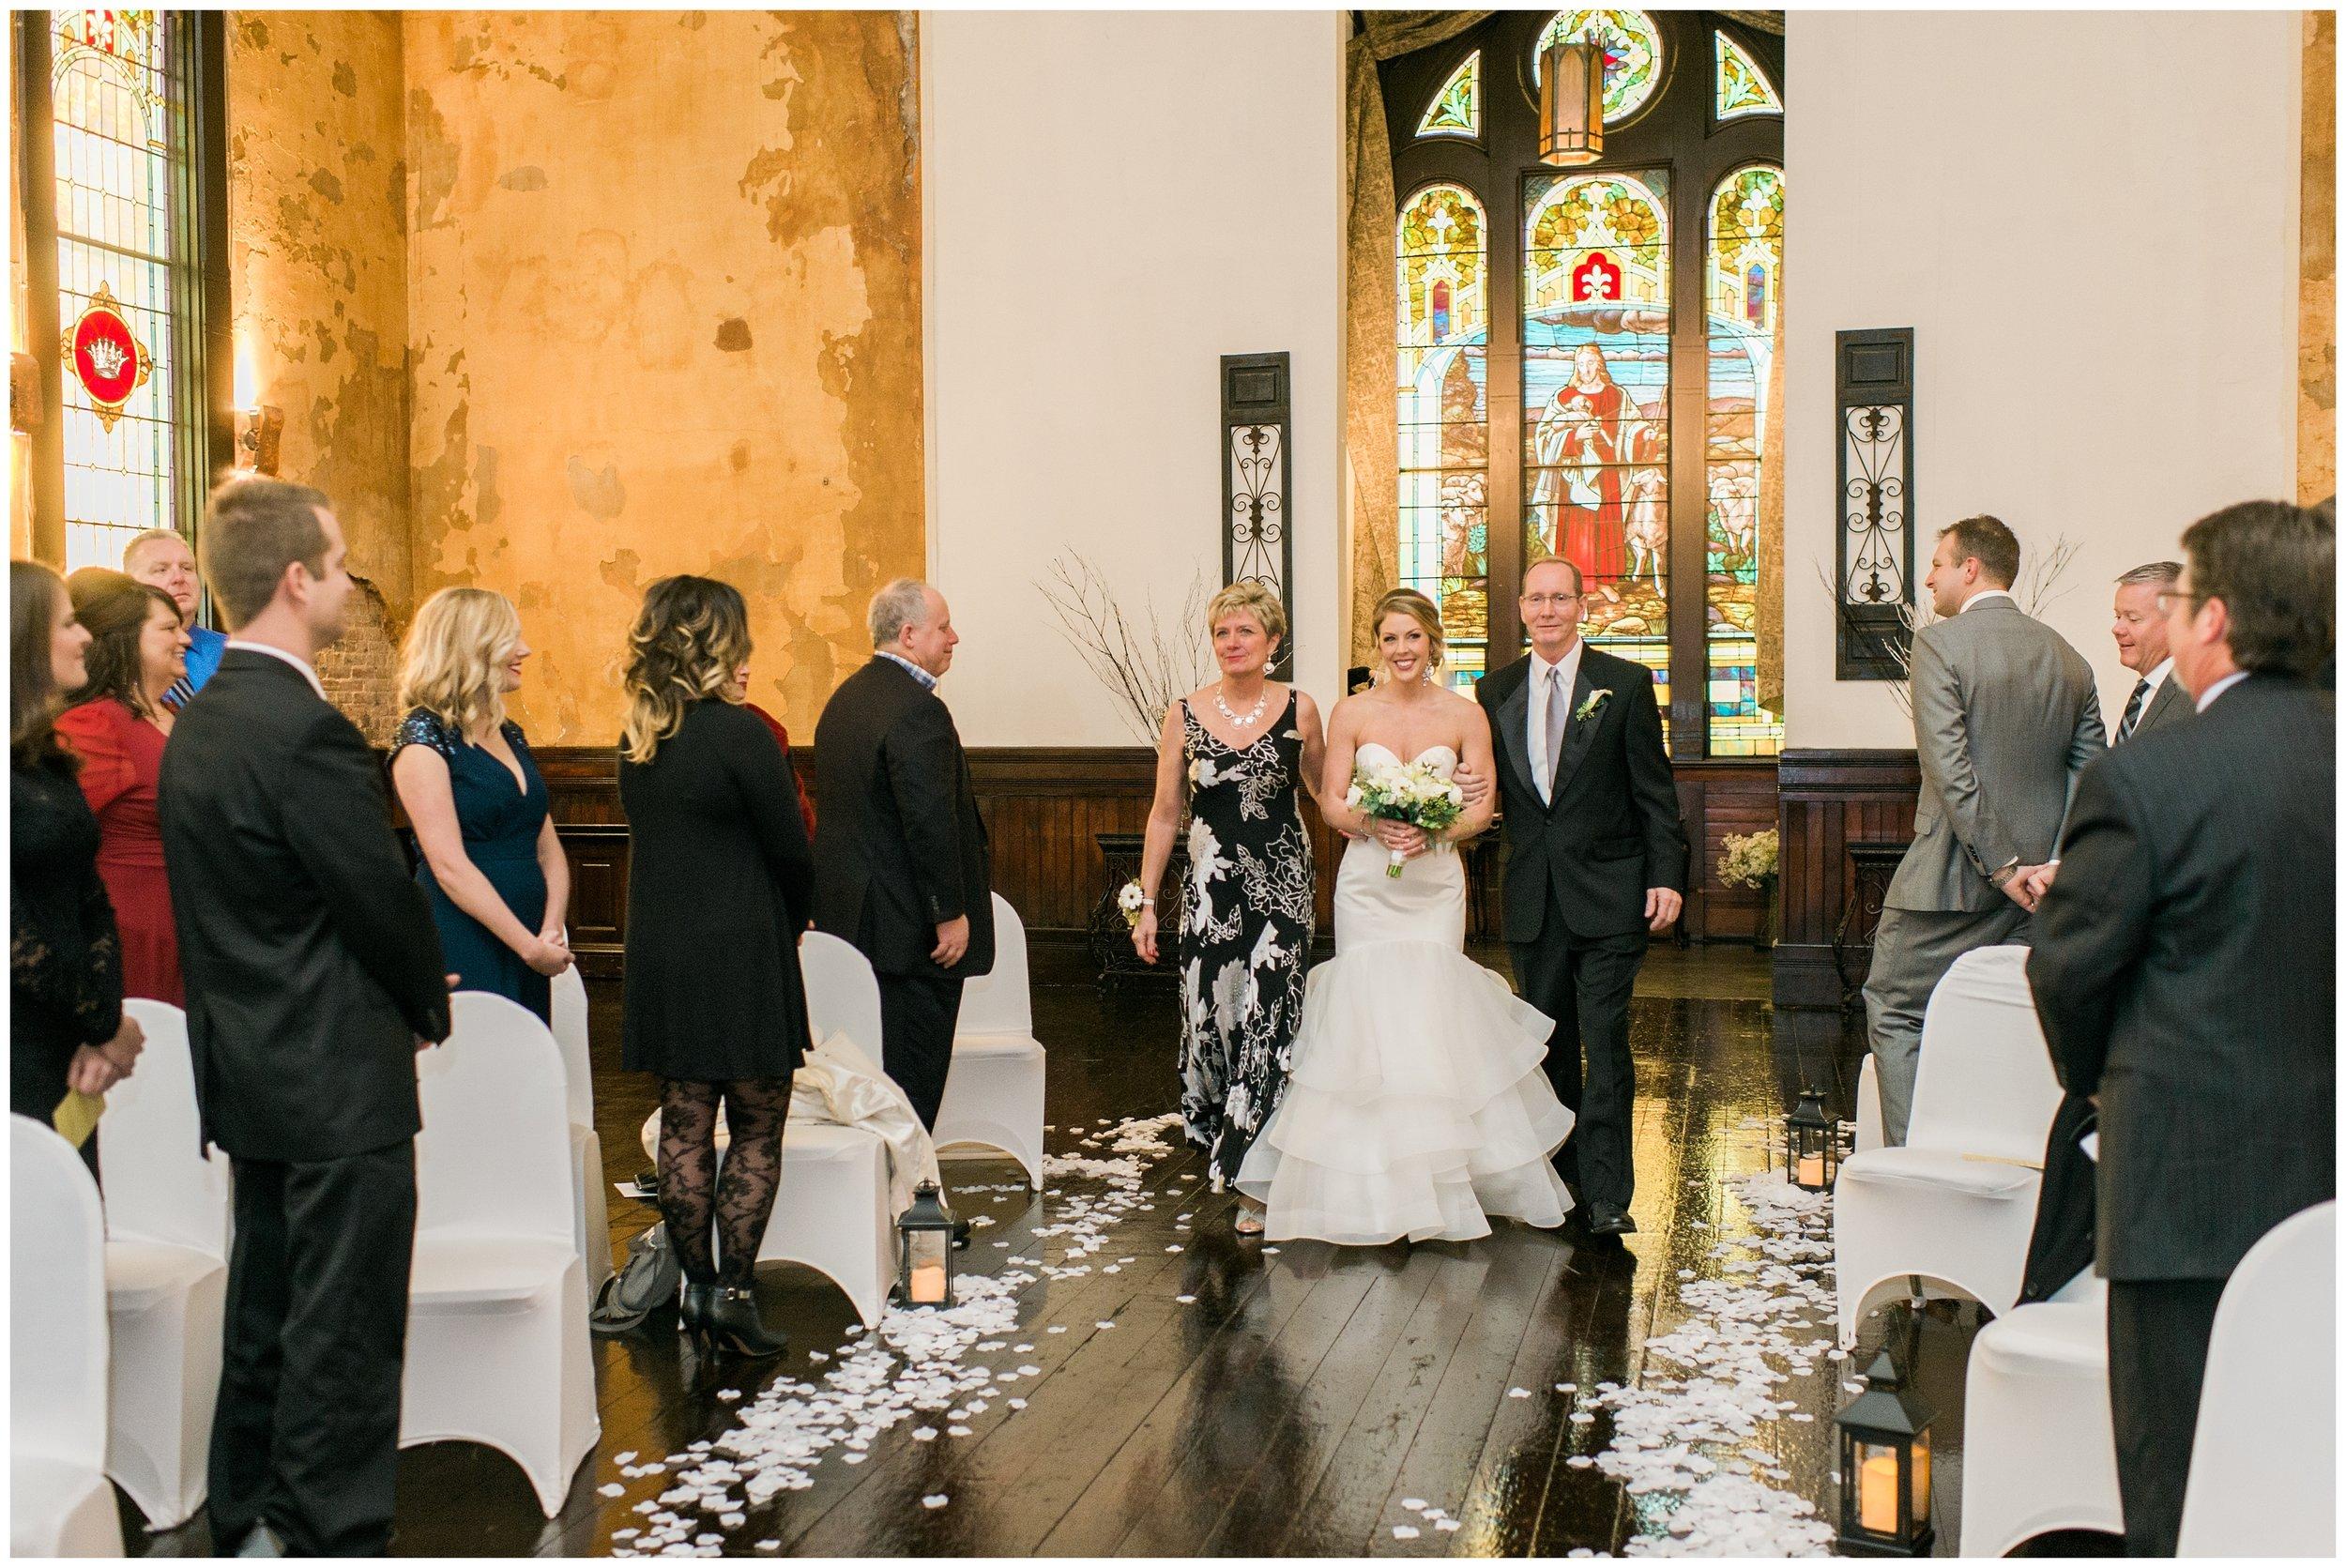 Rebecca_Bridges_Photography_Indianapolis_Wedding_Photographer_5829.jpg